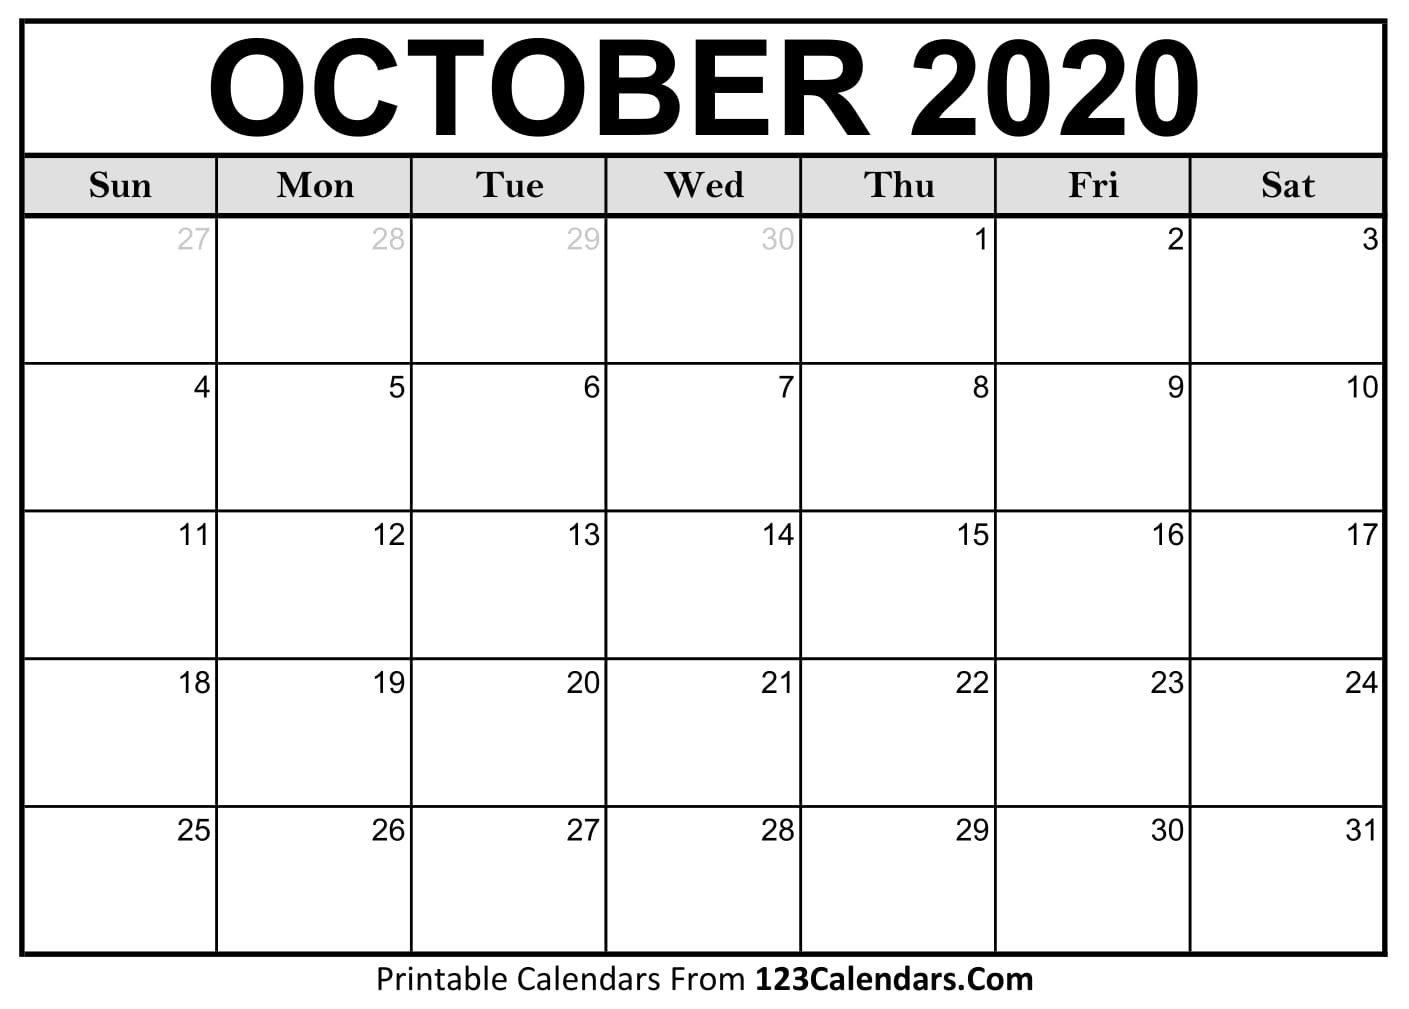 October 2020 Printable Calendar | 123Calendars regarding 2020 Printable Monthly Calendar Free Vertex